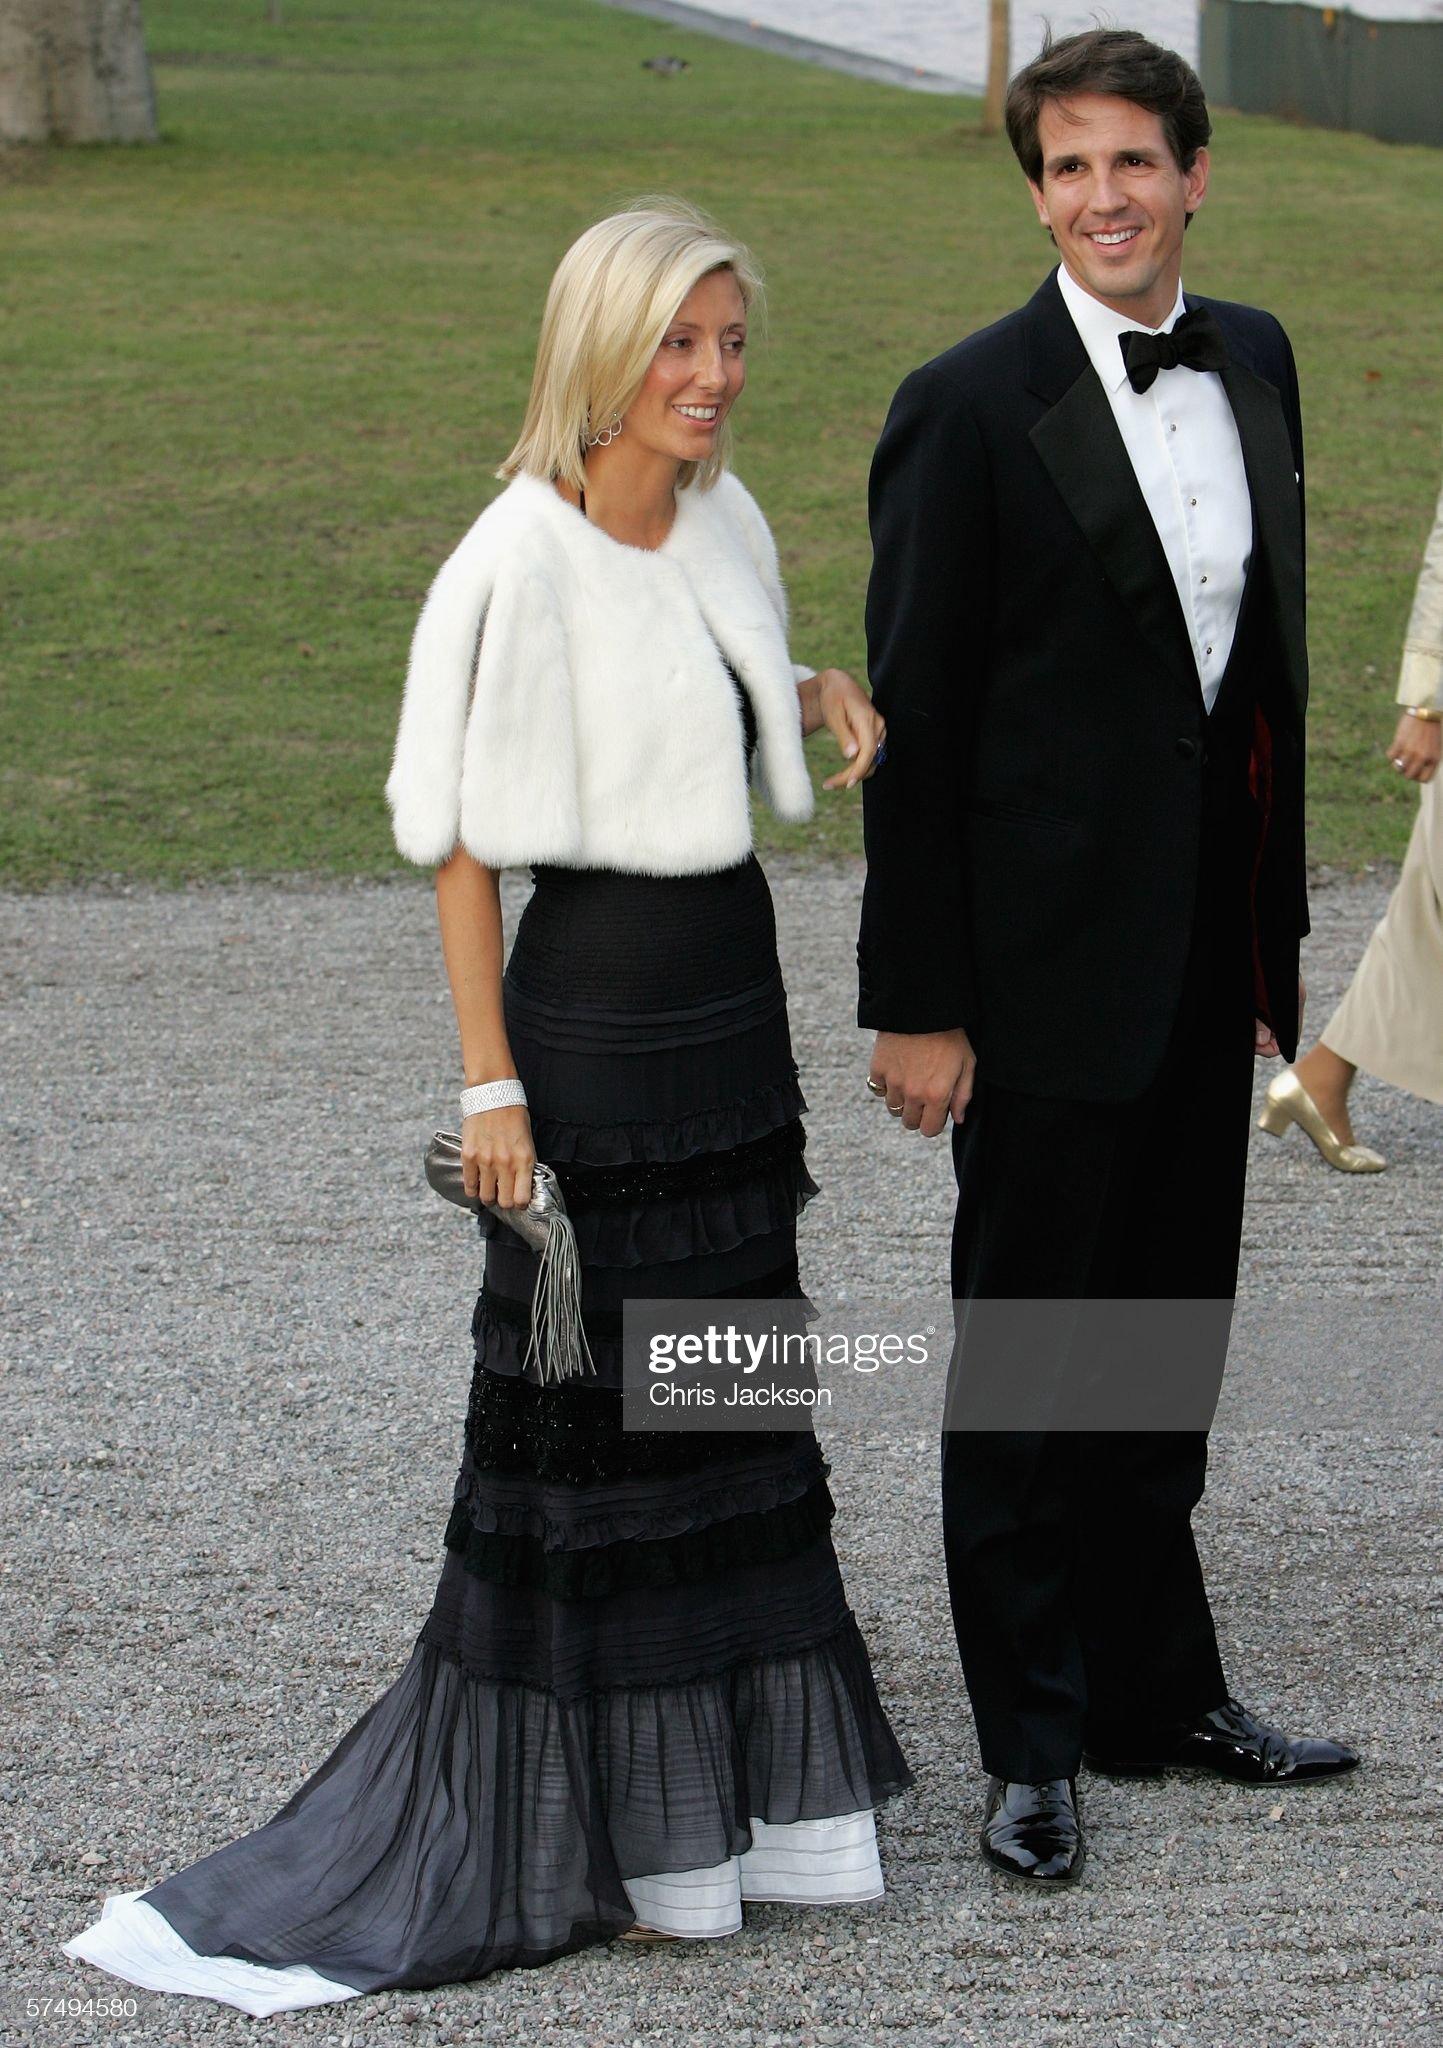 King Carl Gustaf Of Sweden Celebrates His 60th Birthday : News Photo